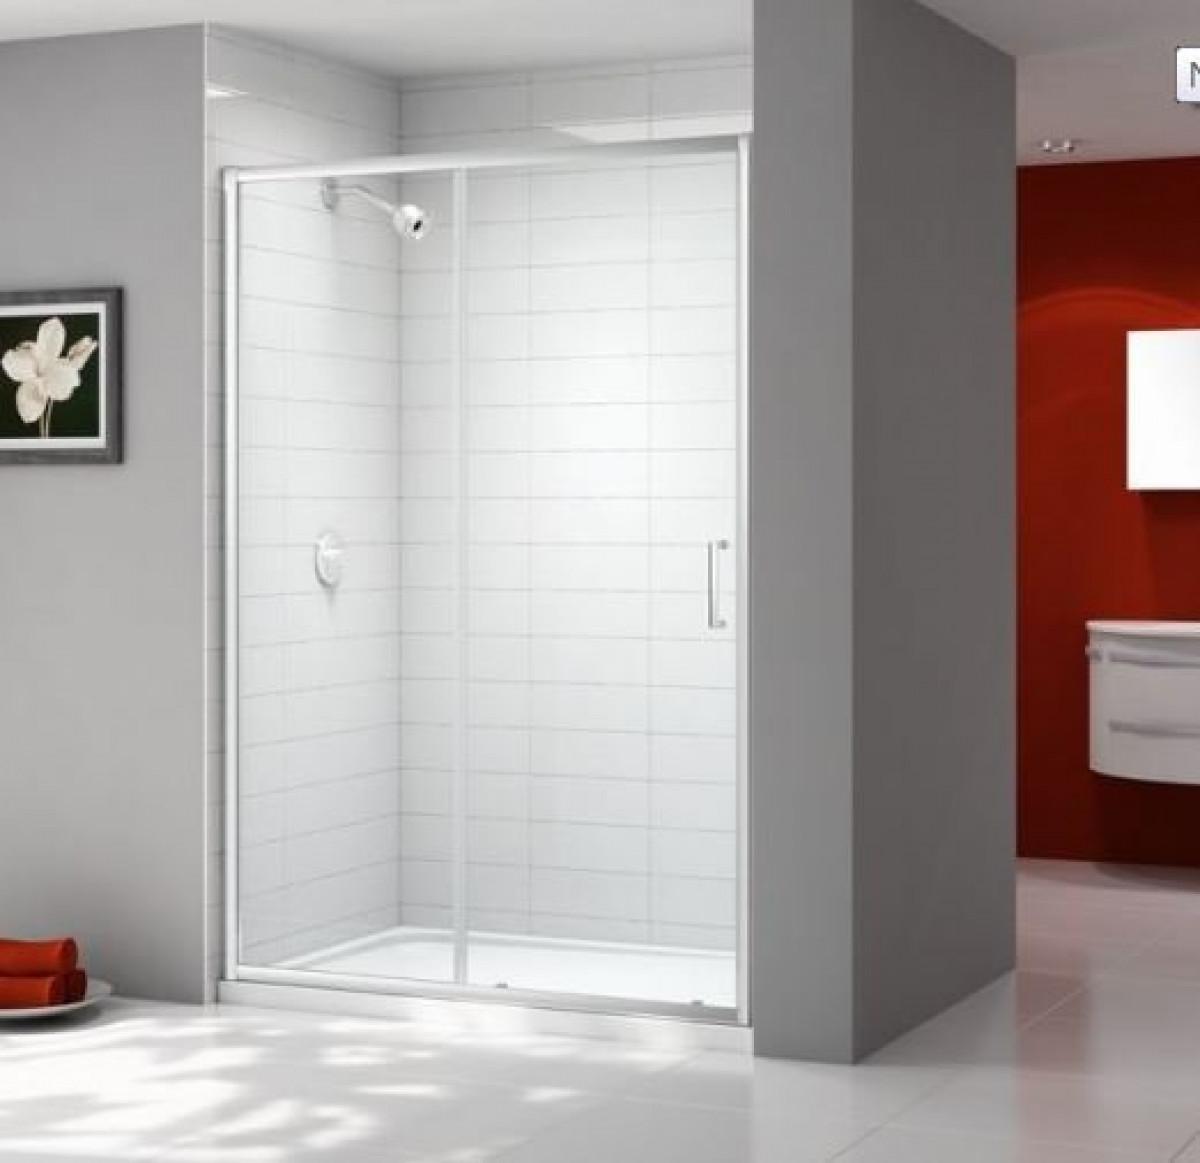 Merlyn ionic express 1500mm sliding shower door a0304gh for 1500 sliding shower door